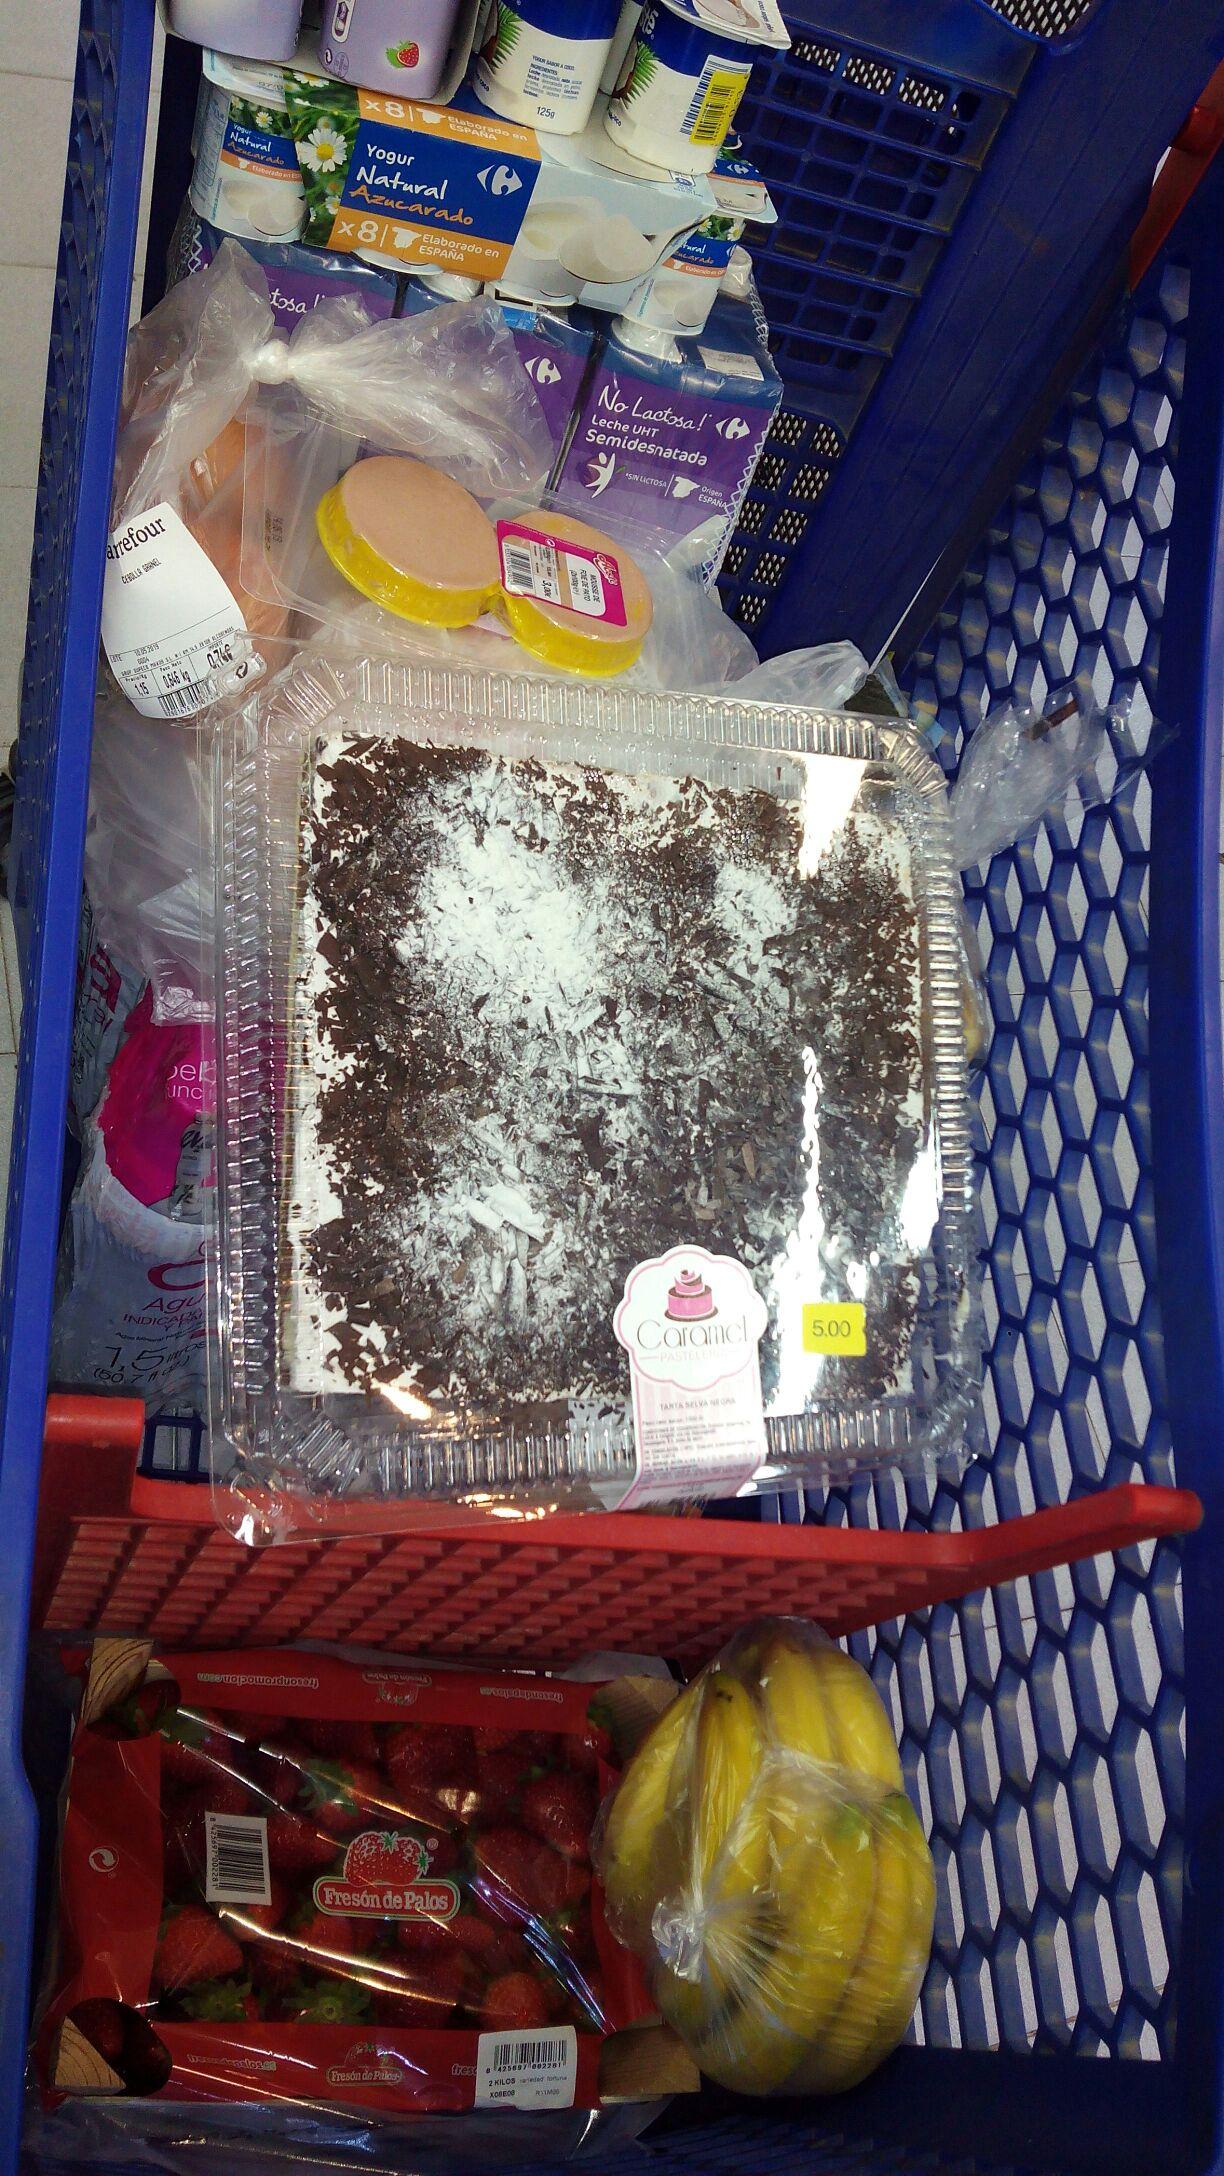 Tartas baratitas en Carrefour Figueras